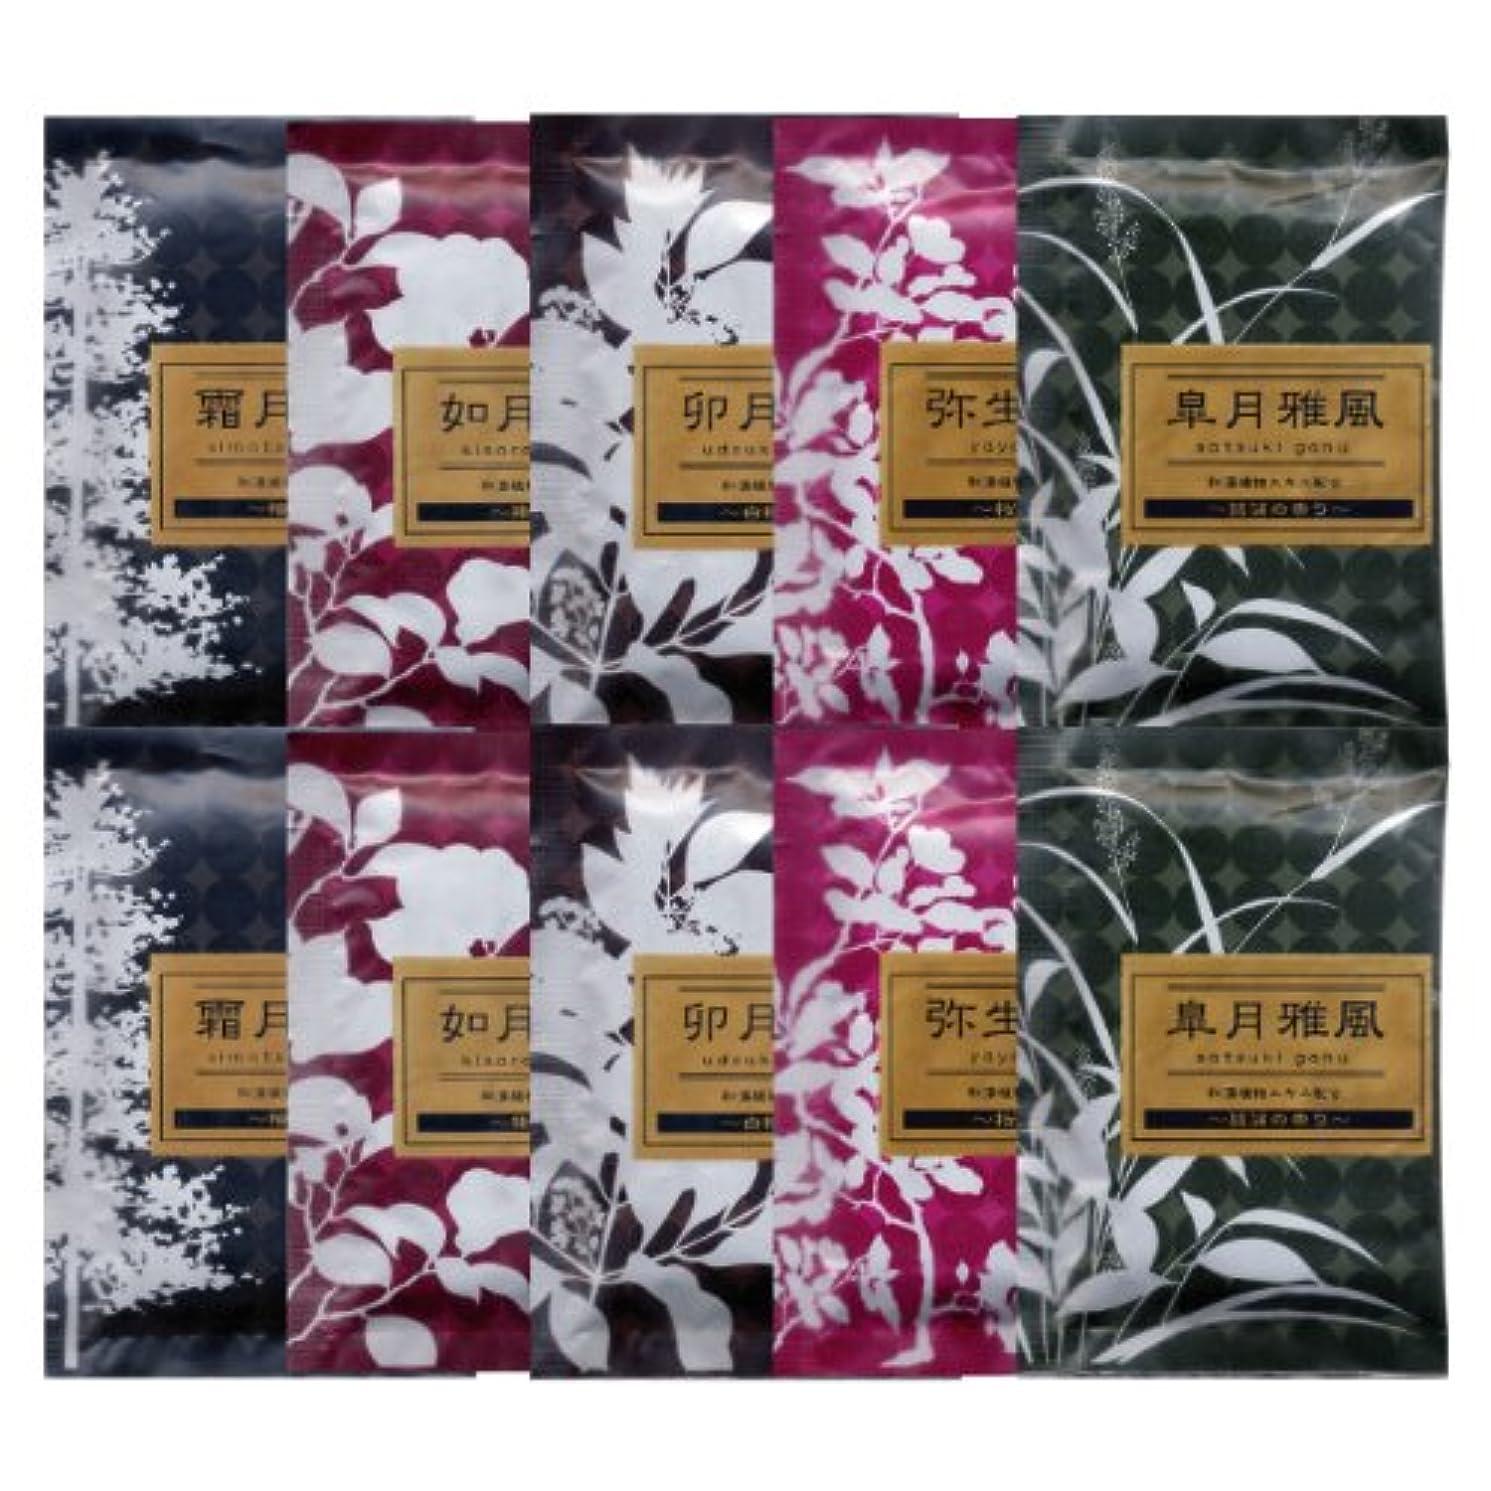 自然先行する蚊薬用入浴剤 綺羅の刻 5種類×2 10包